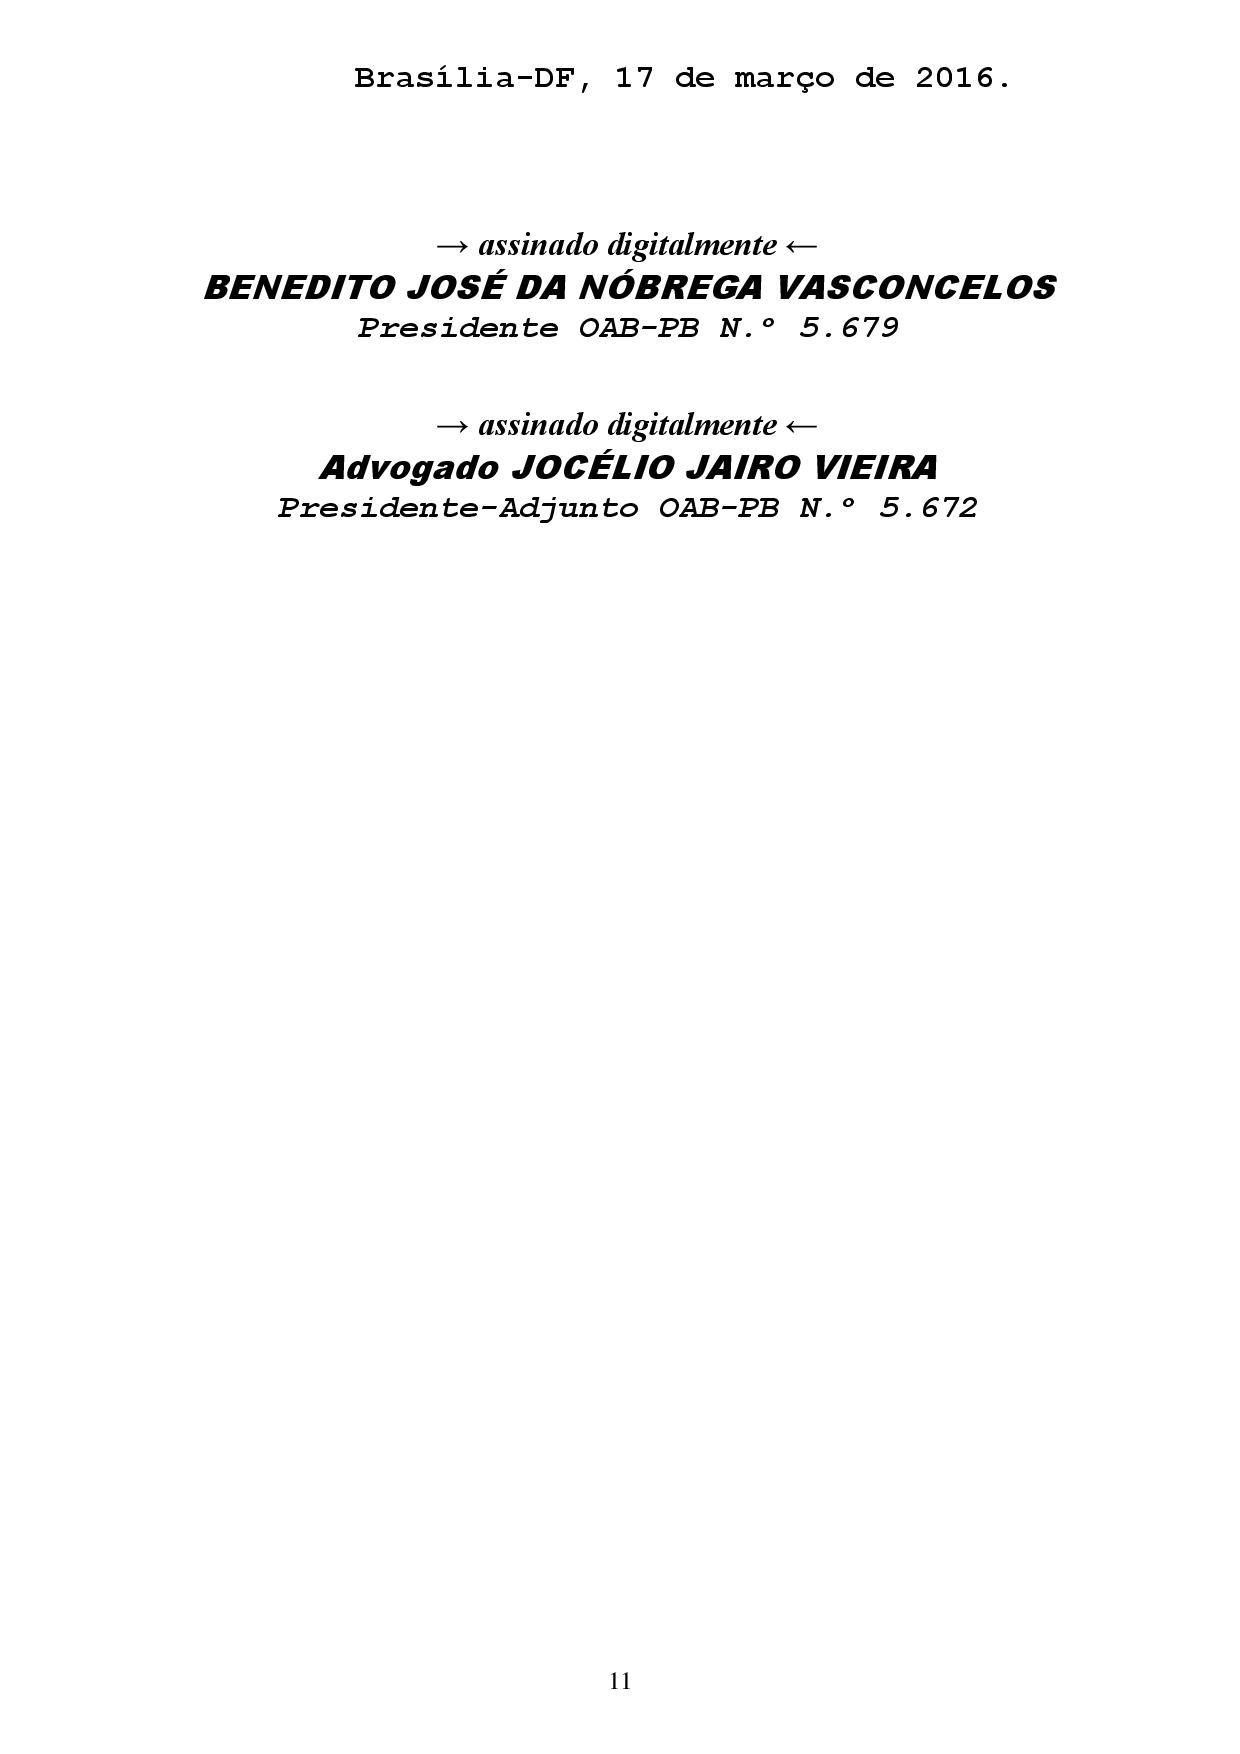 reclamacao correicional 1 page 011 - Sindicato dos Advogados da Paraíba pede no CNJ afastamento de Sergio Moro